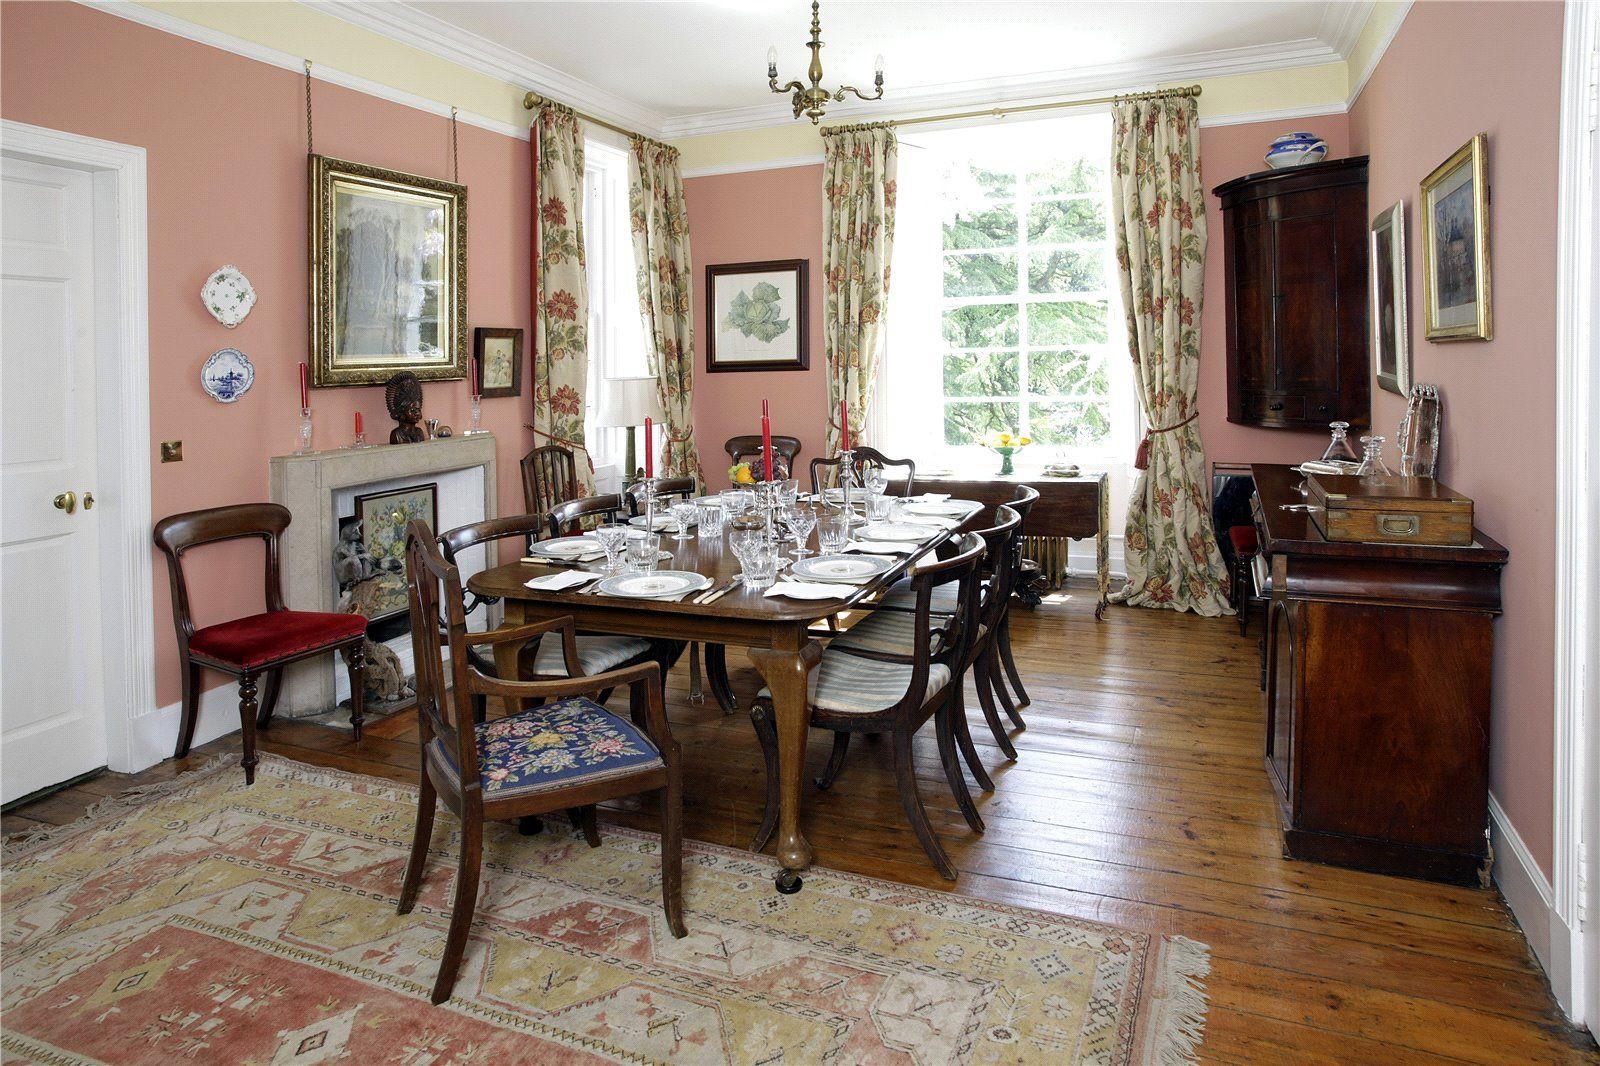 cheap hardwood flooring glasgow of savills ashfield house gartocharn g83 8nb property for sale for gls100117 48 l gal